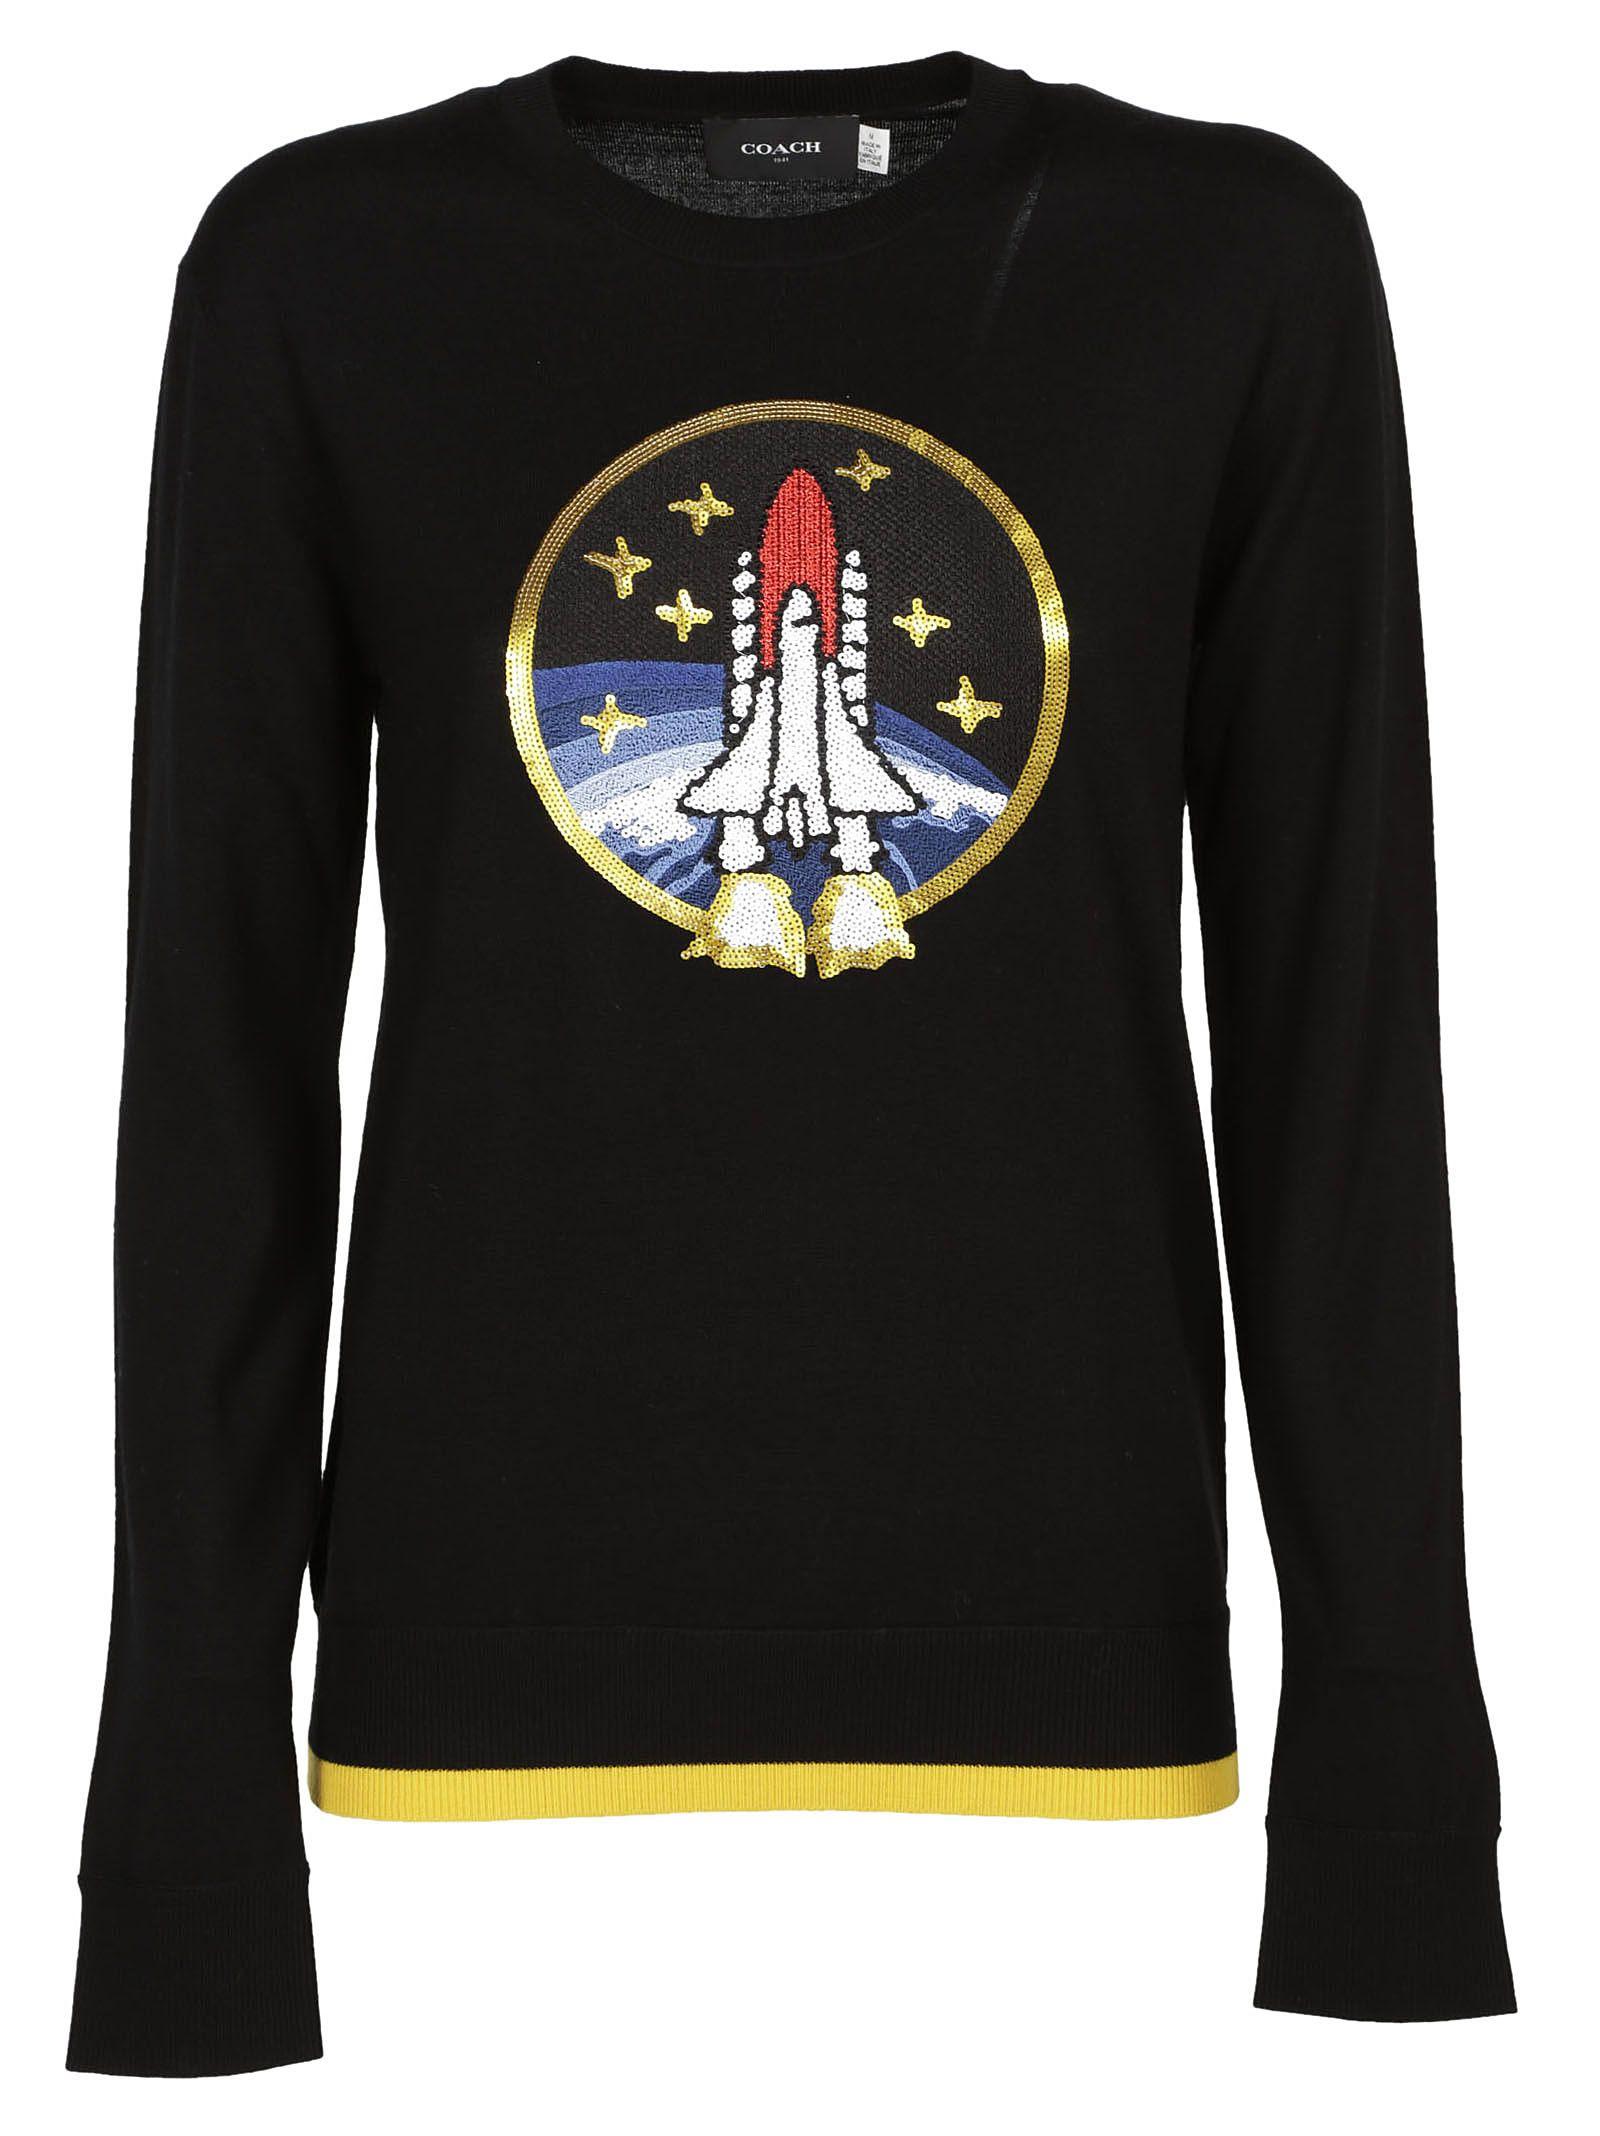 Coach Coach Space Rocket Sweater